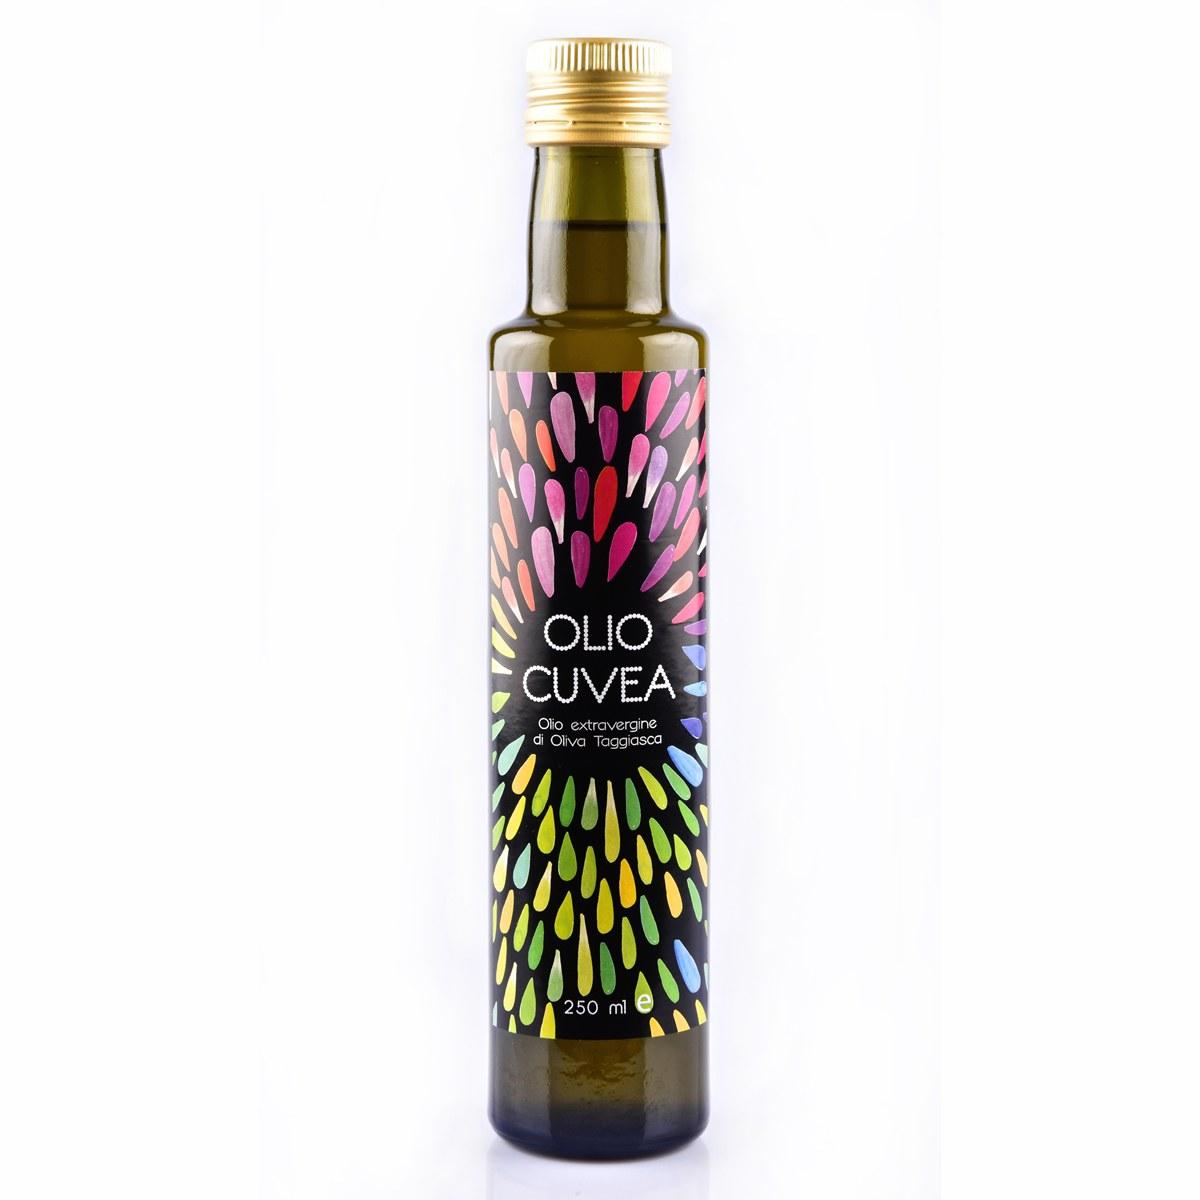 Taggiasca Olivenöl Cuvea - Extra natives olivenöl aus Ligurien